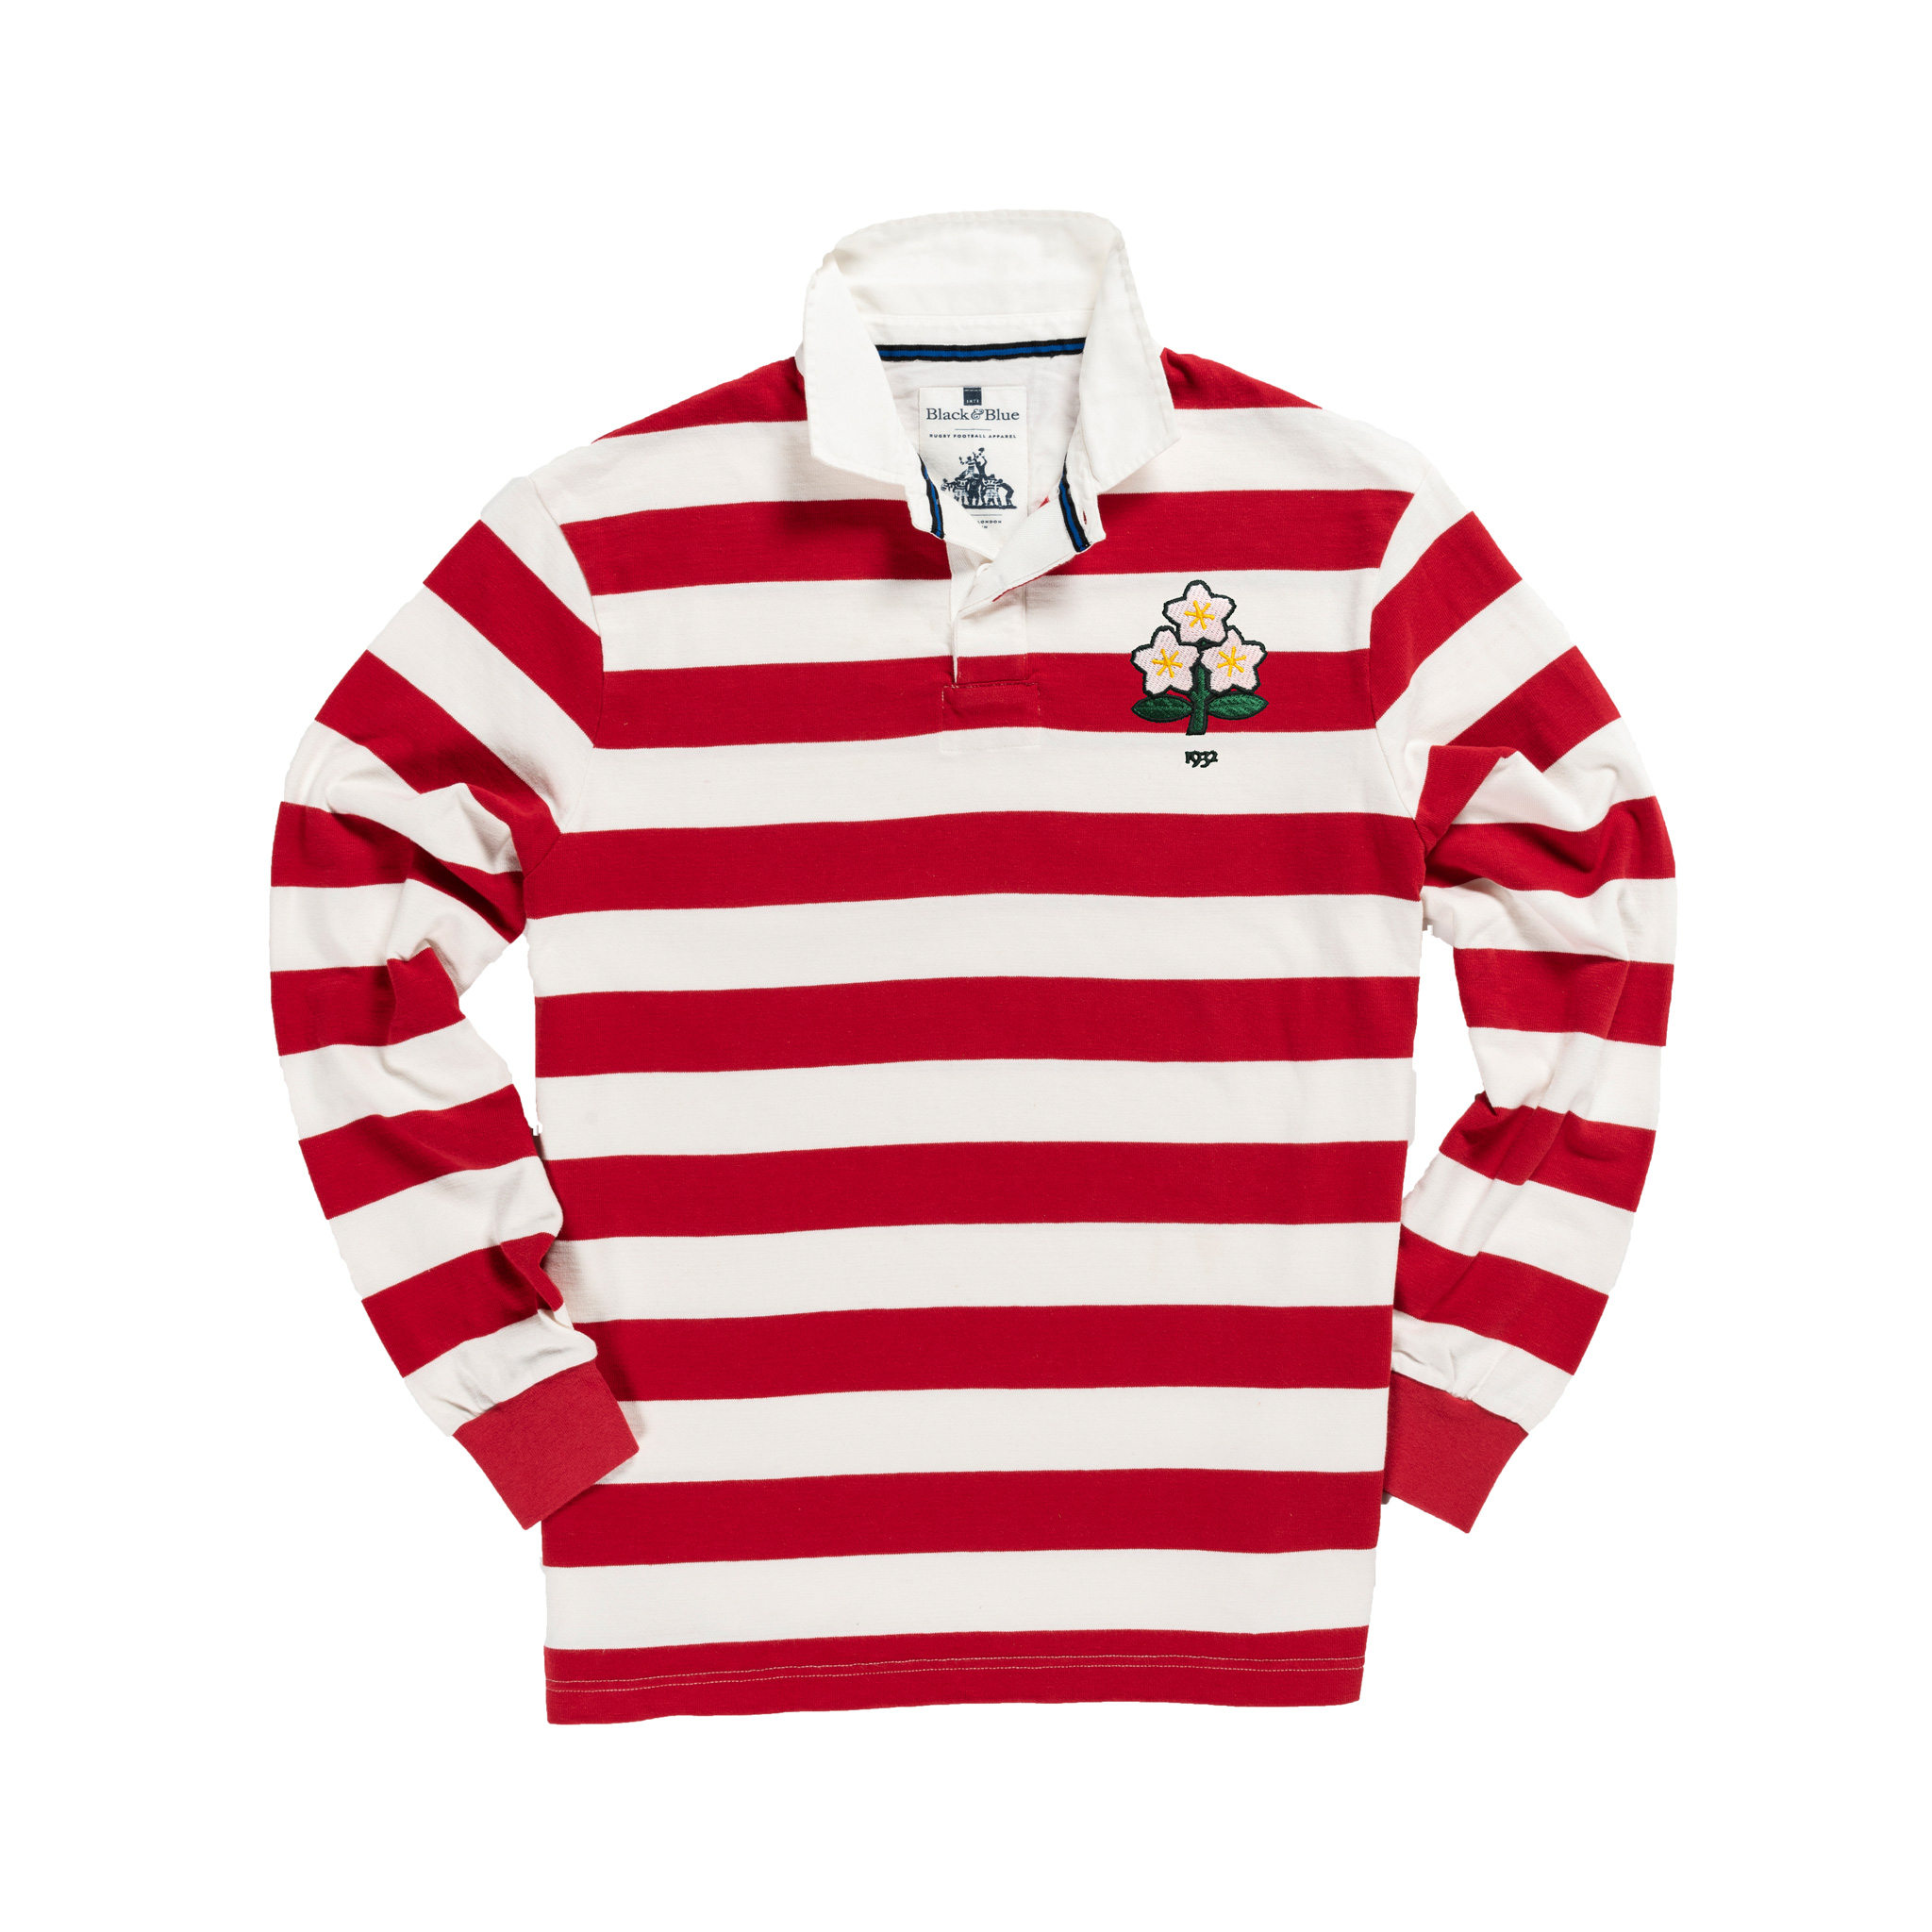 Japan 1932 Vintage Rugby Shirt